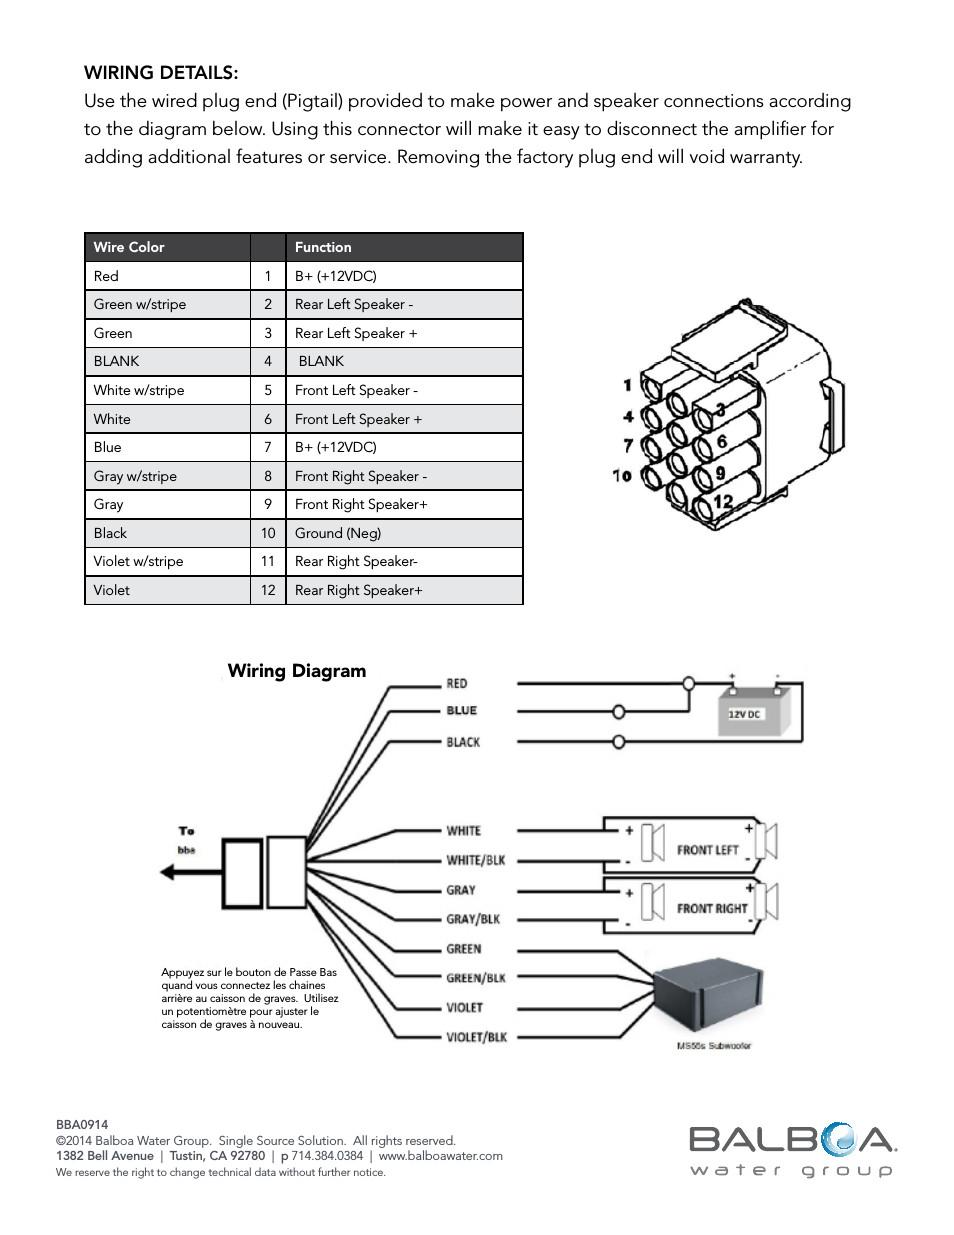 wiring 240v bas mx 2197  watkins hot tub wiring download diagram  watkins hot tub wiring download diagram